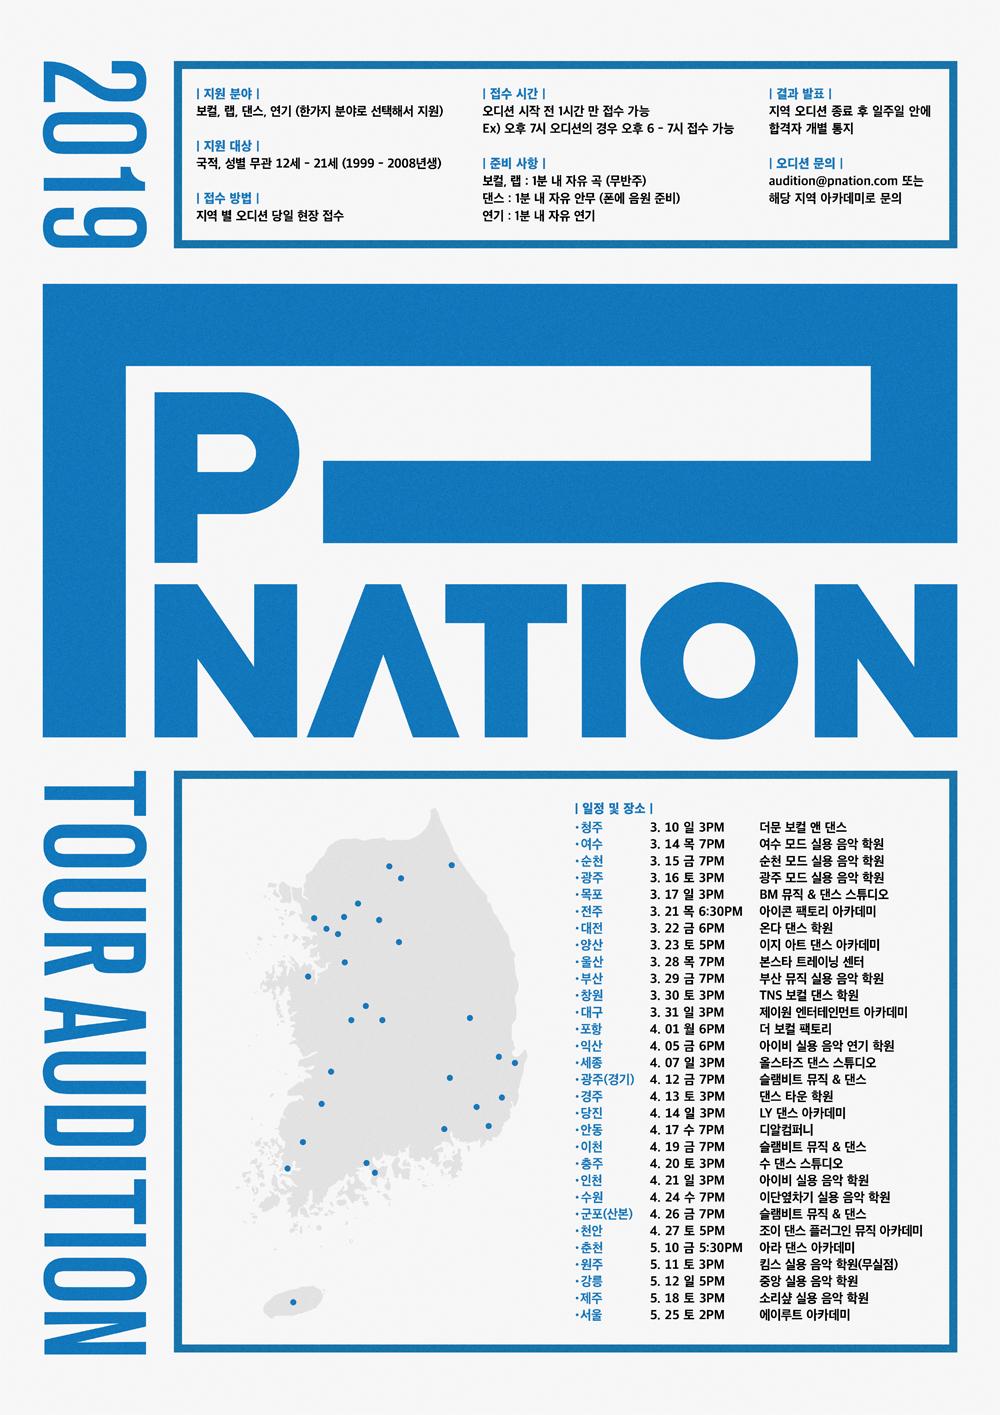 Pnation123